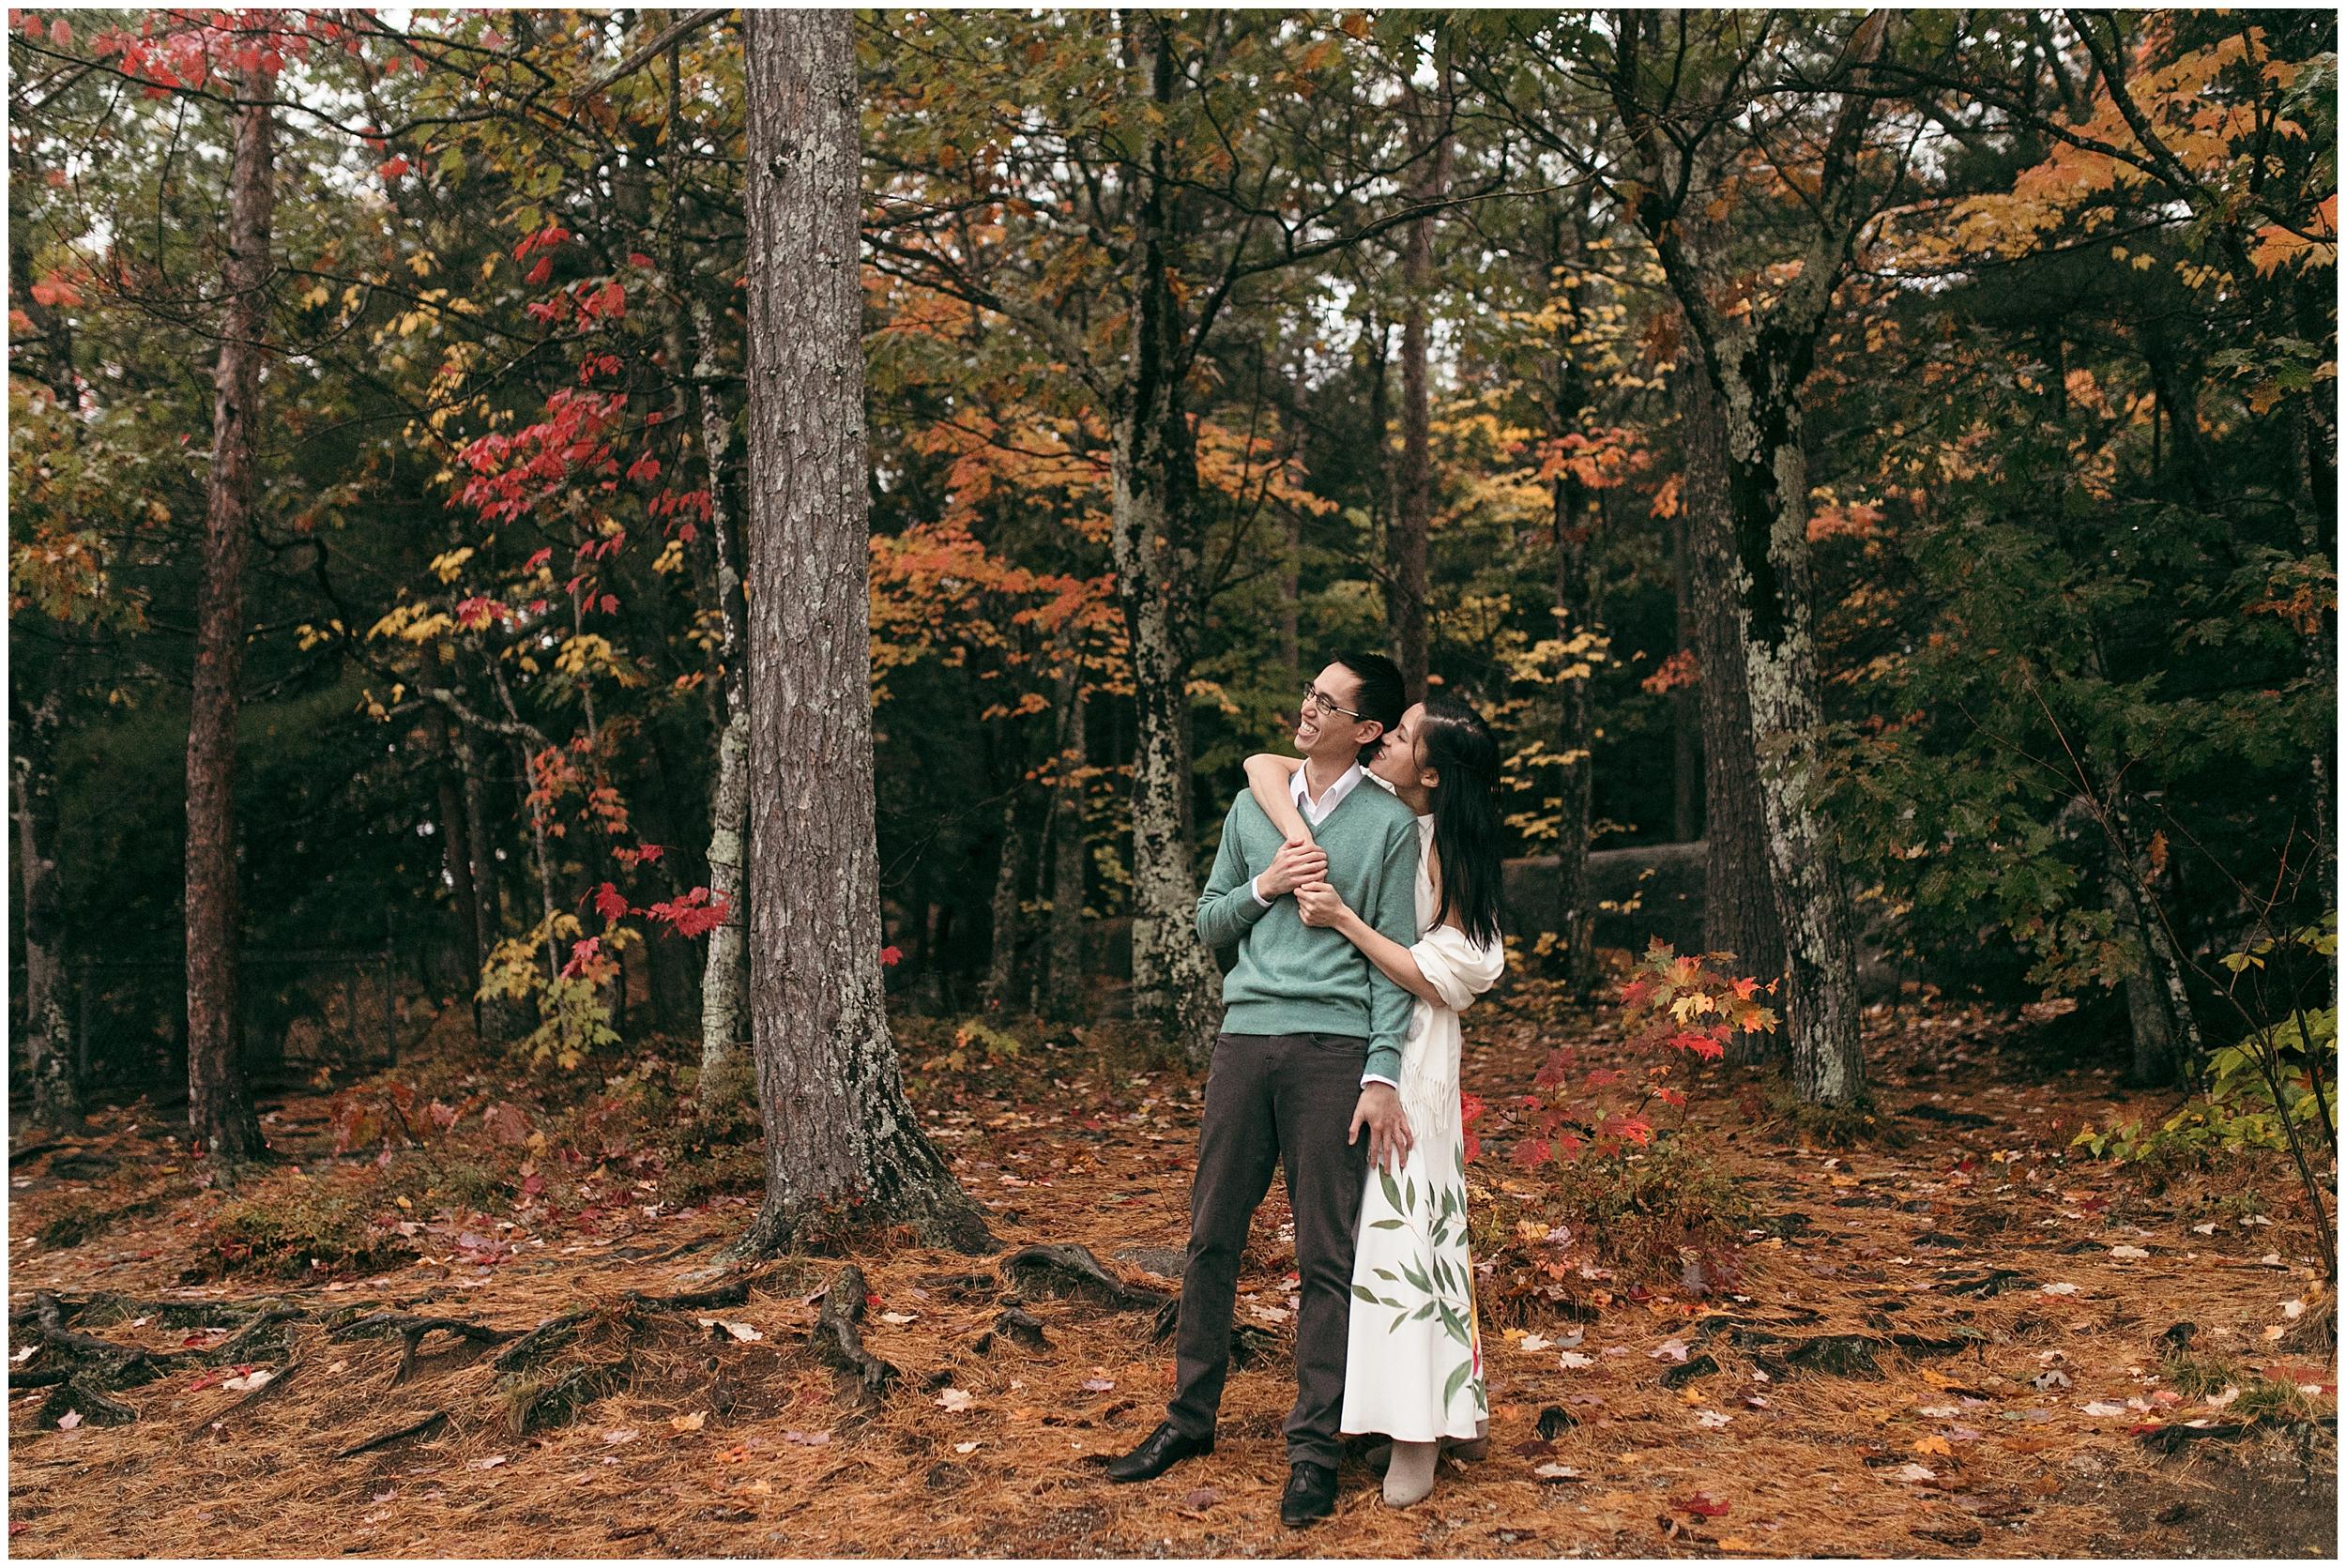 White-Mountains-Engagement-Bailey-Q-Photo-New-Hampshire-Wedding-Photographer-28.jpg